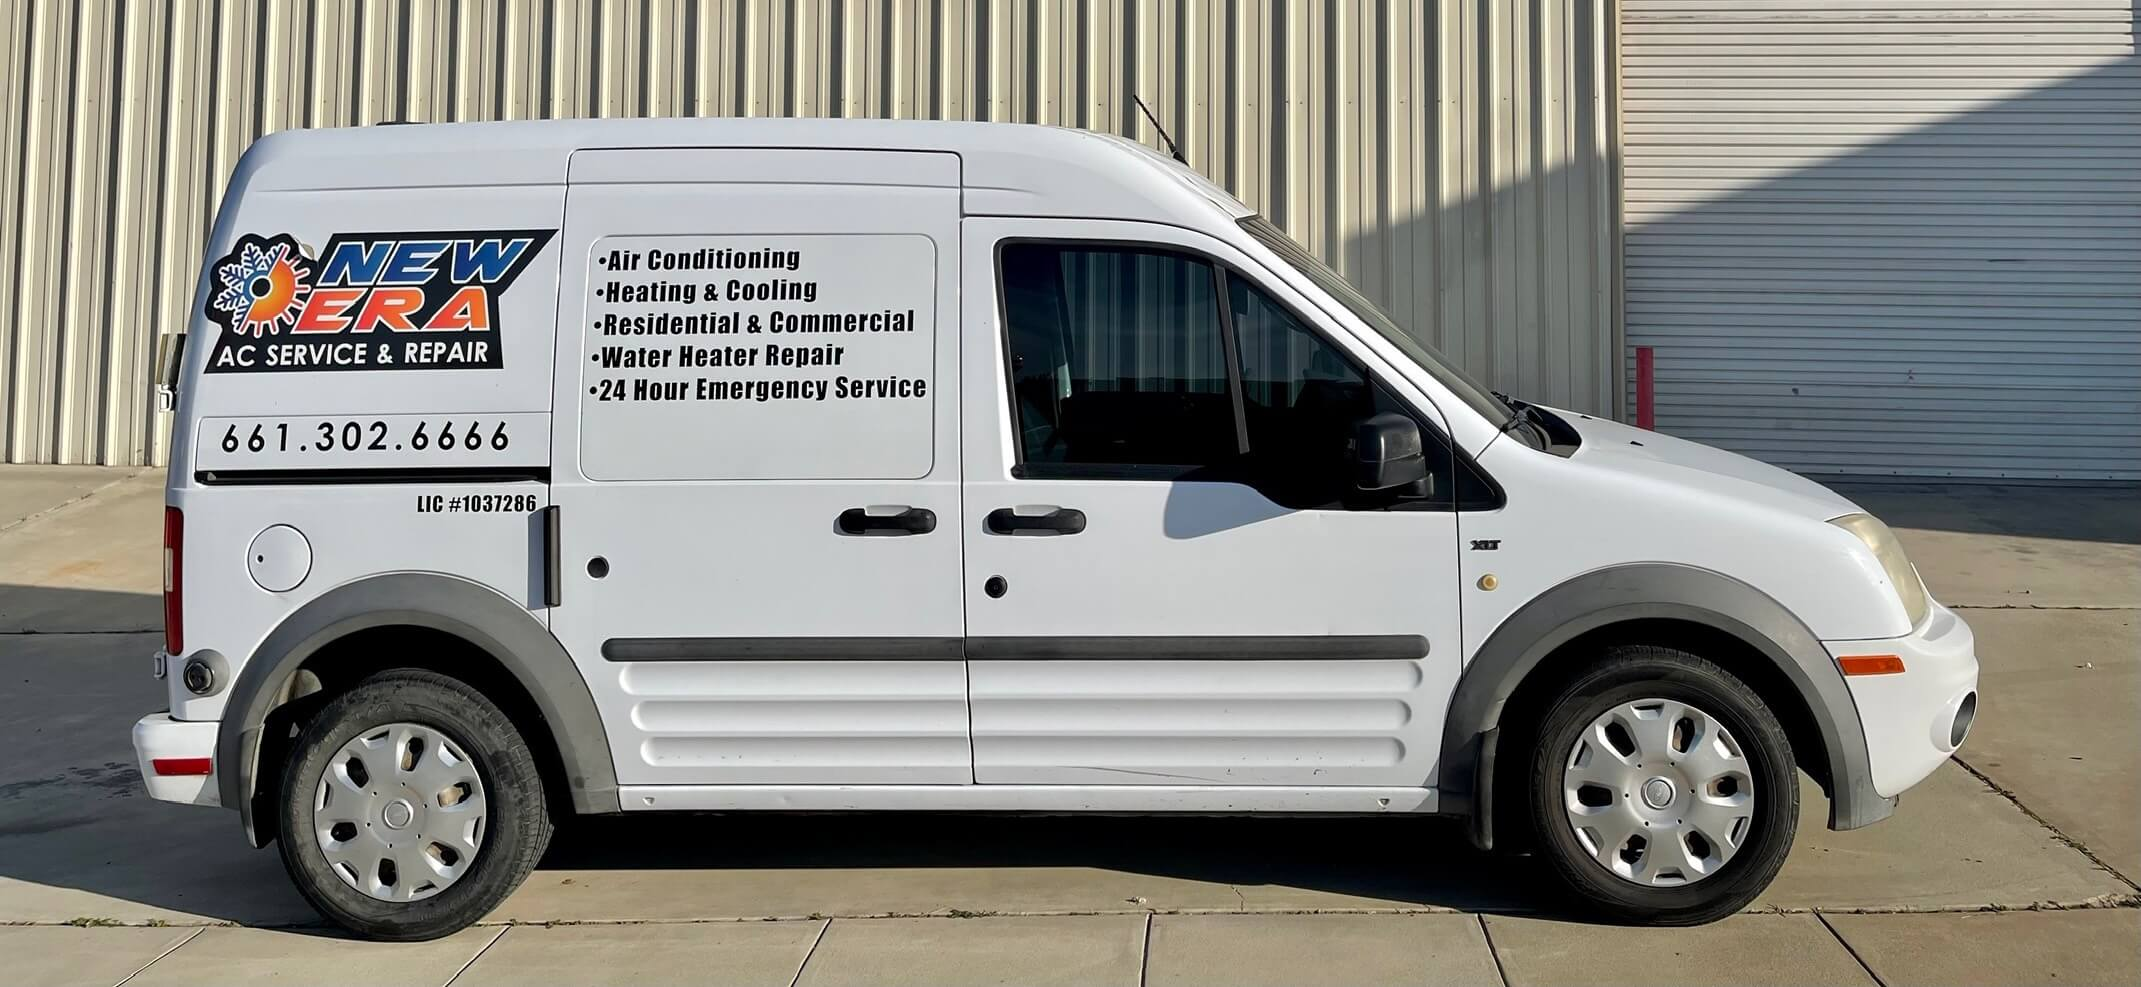 new-era-hvac-service-and-repair-in-bakersfield-ca